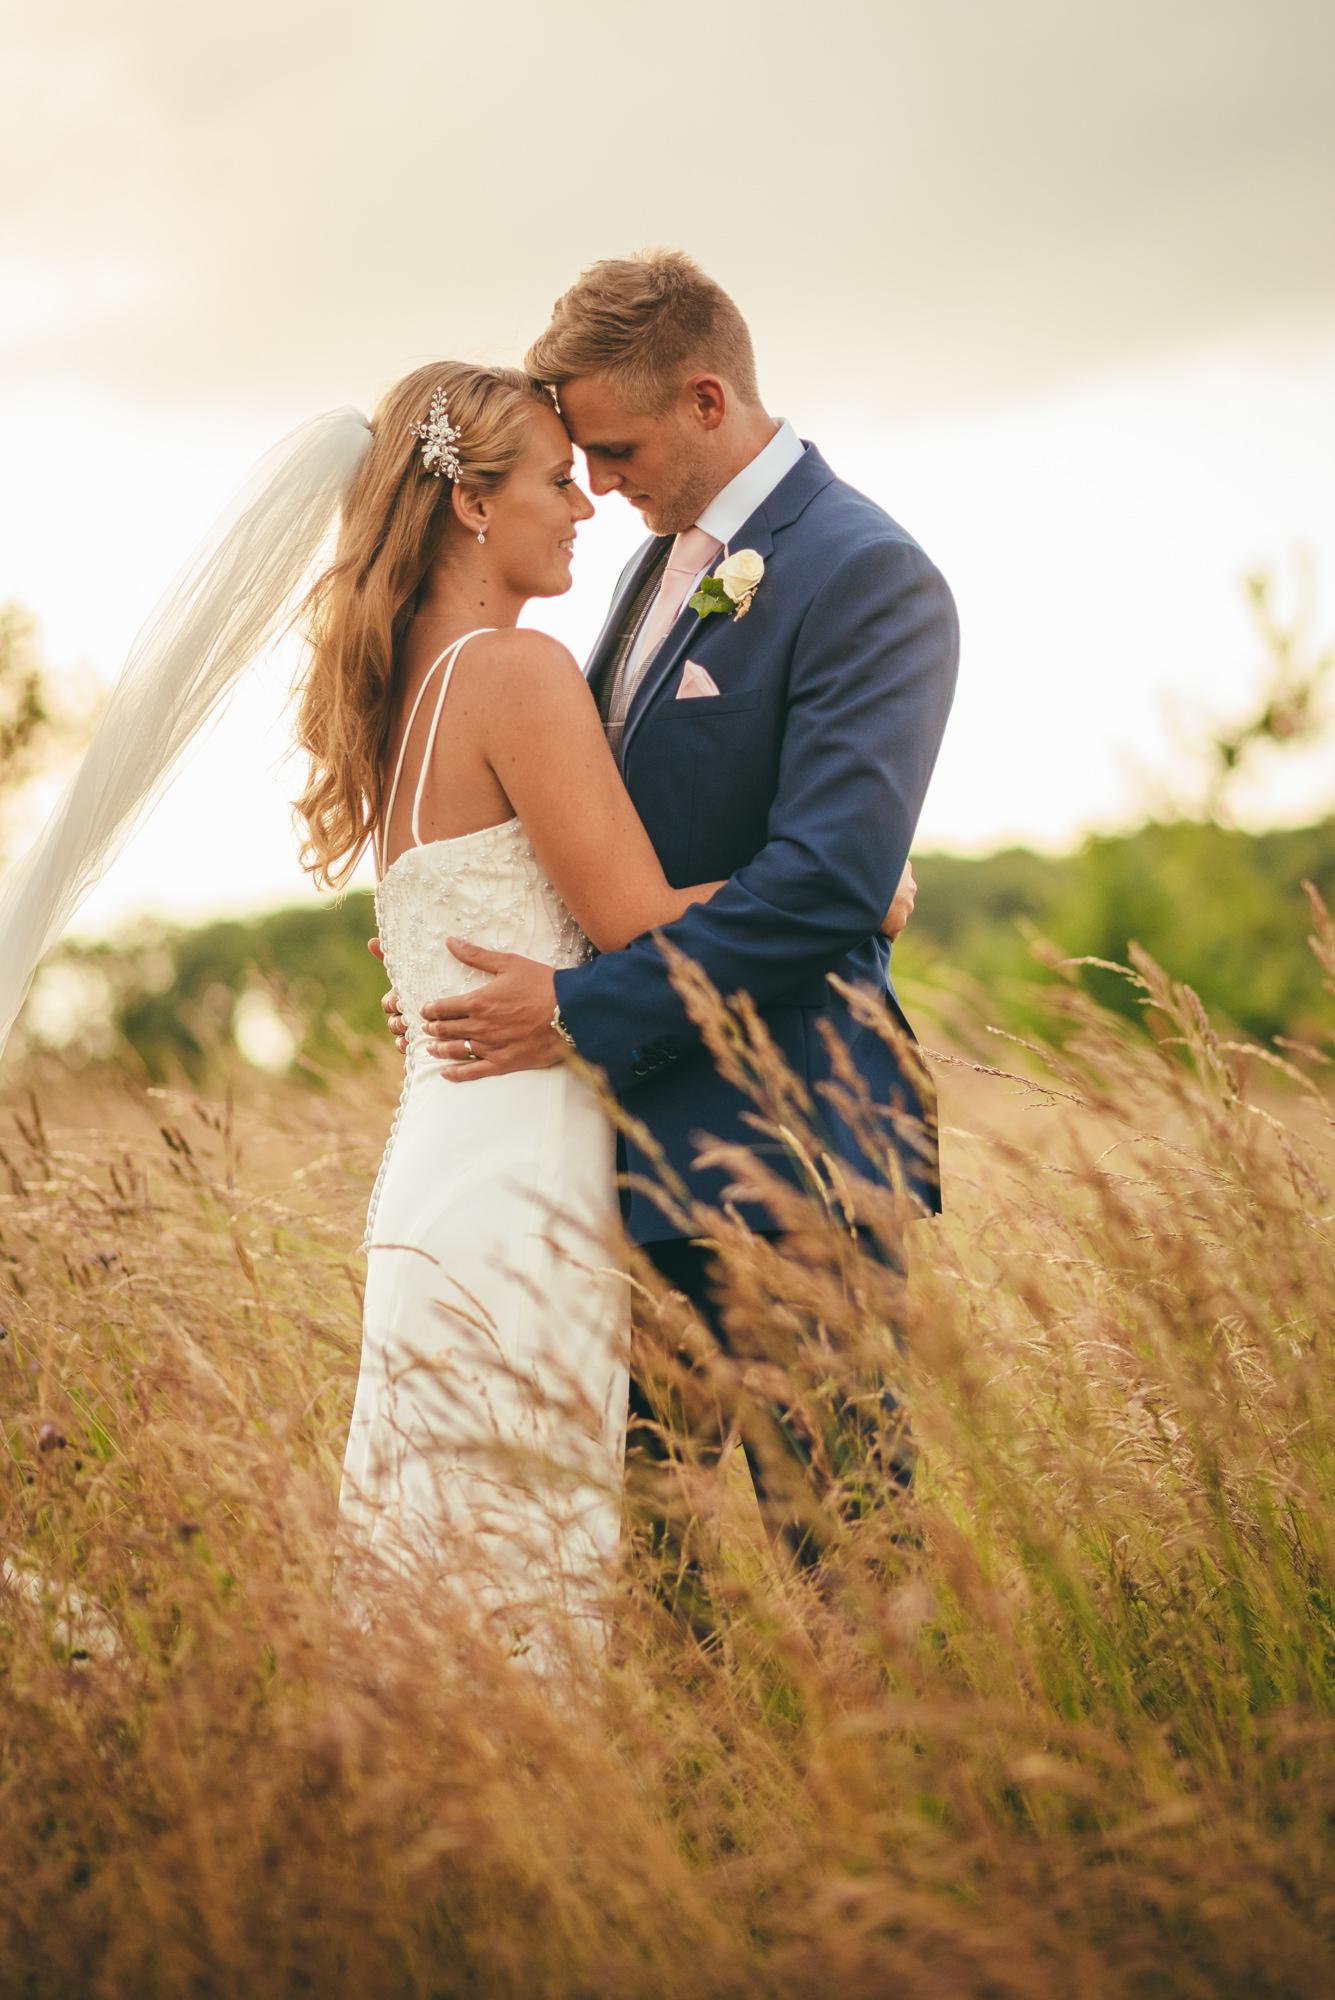 rutland-wedding-photographer-2.jpg-001-2.jpg